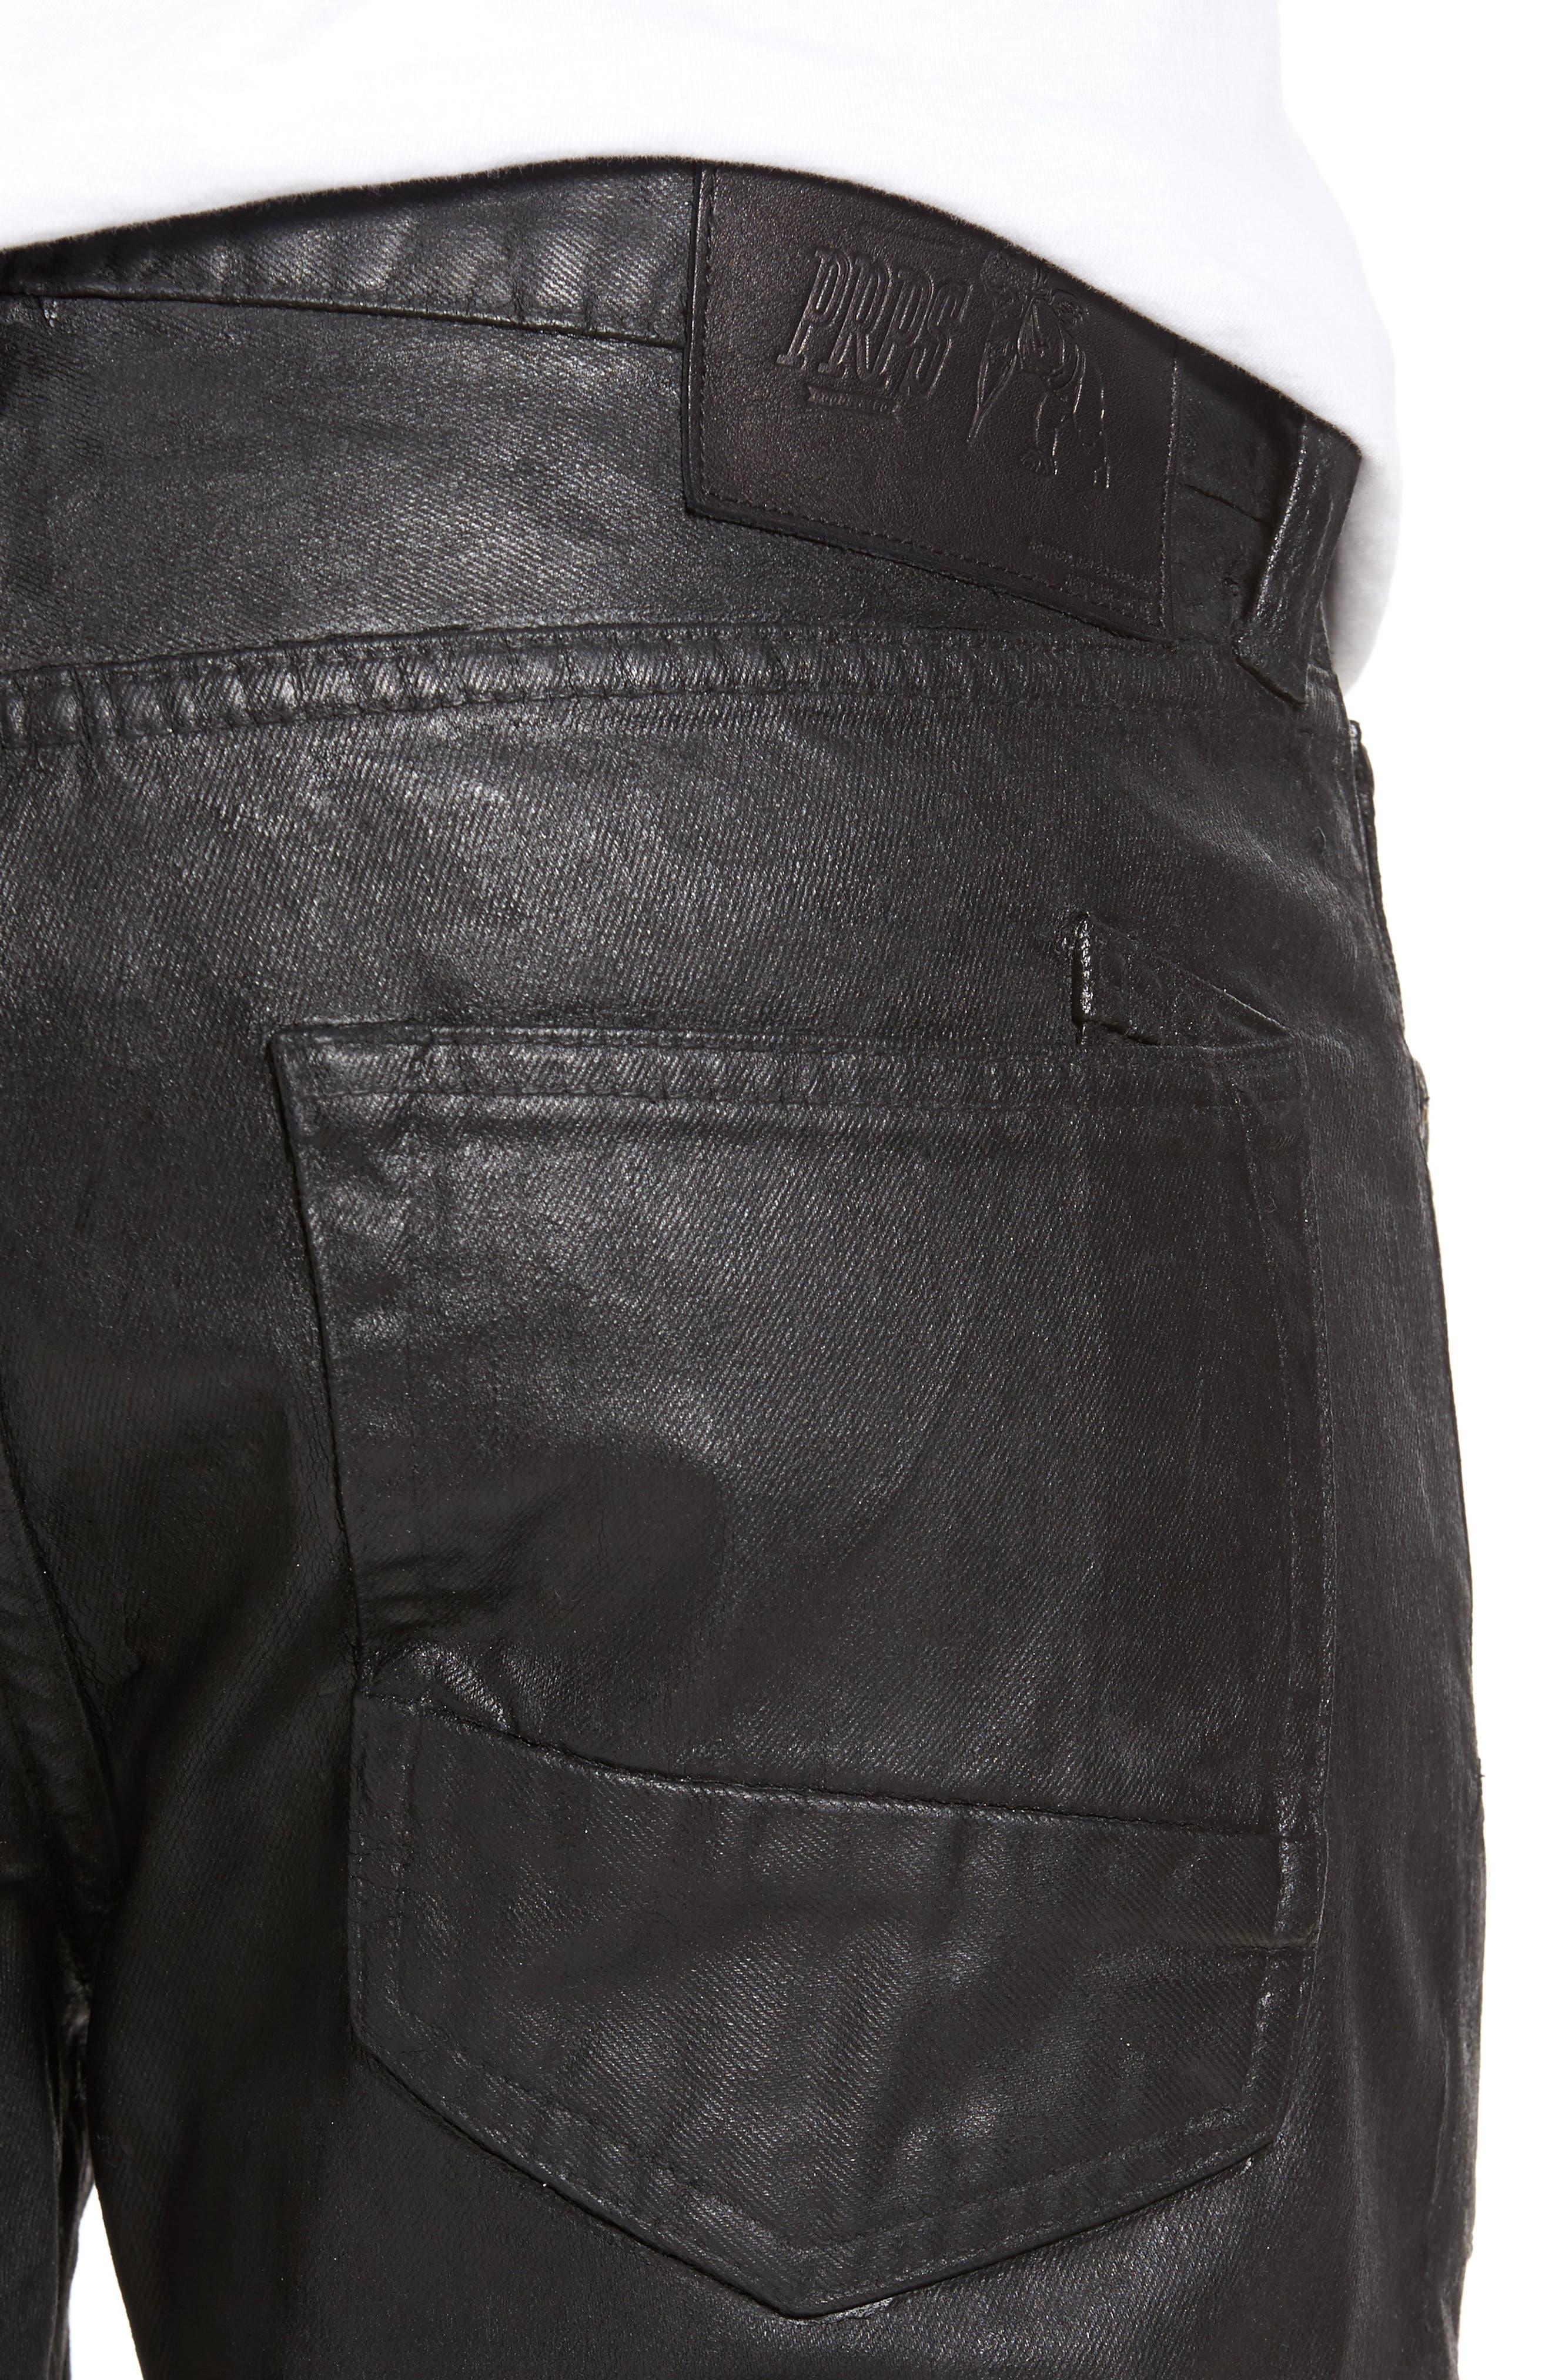 Demon Slim Straight Coated Jeans,                             Alternate thumbnail 4, color,                             BLACK